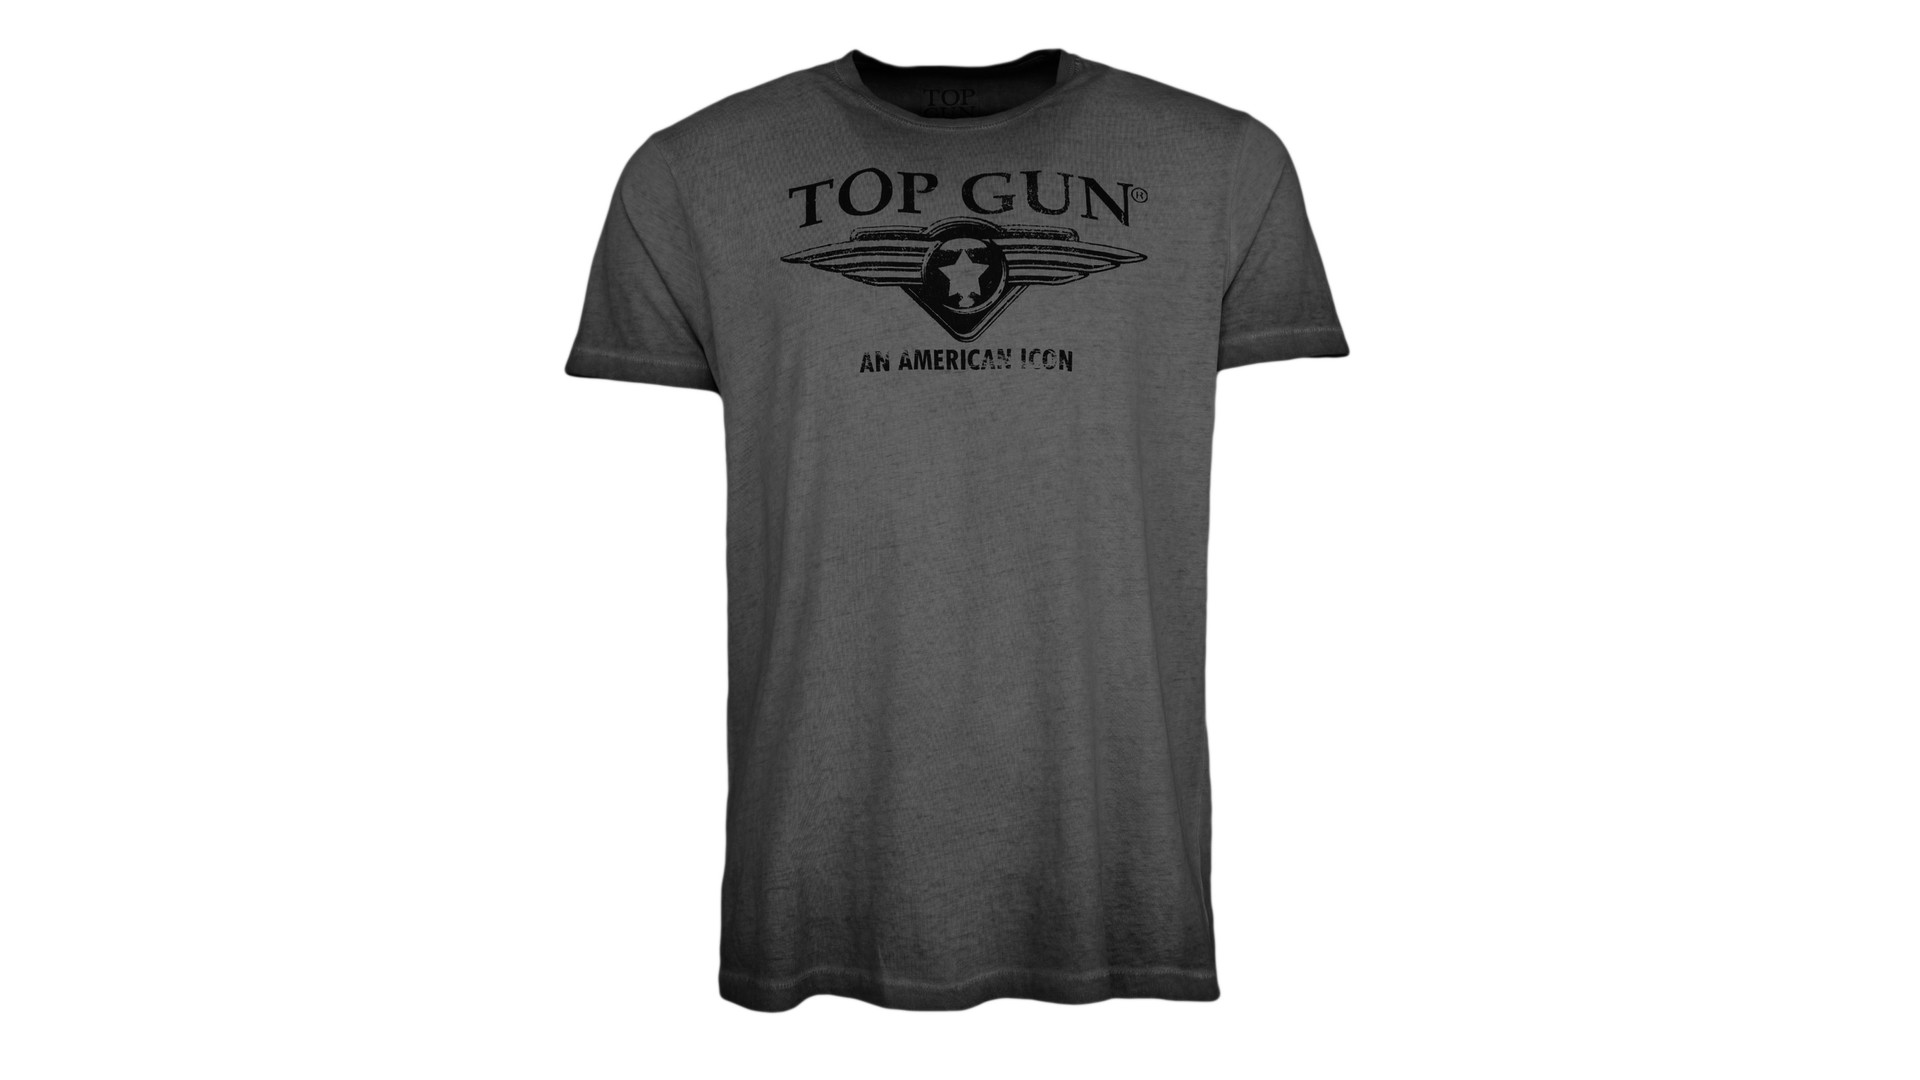 Top Gun TGM-1713 Tshirt black